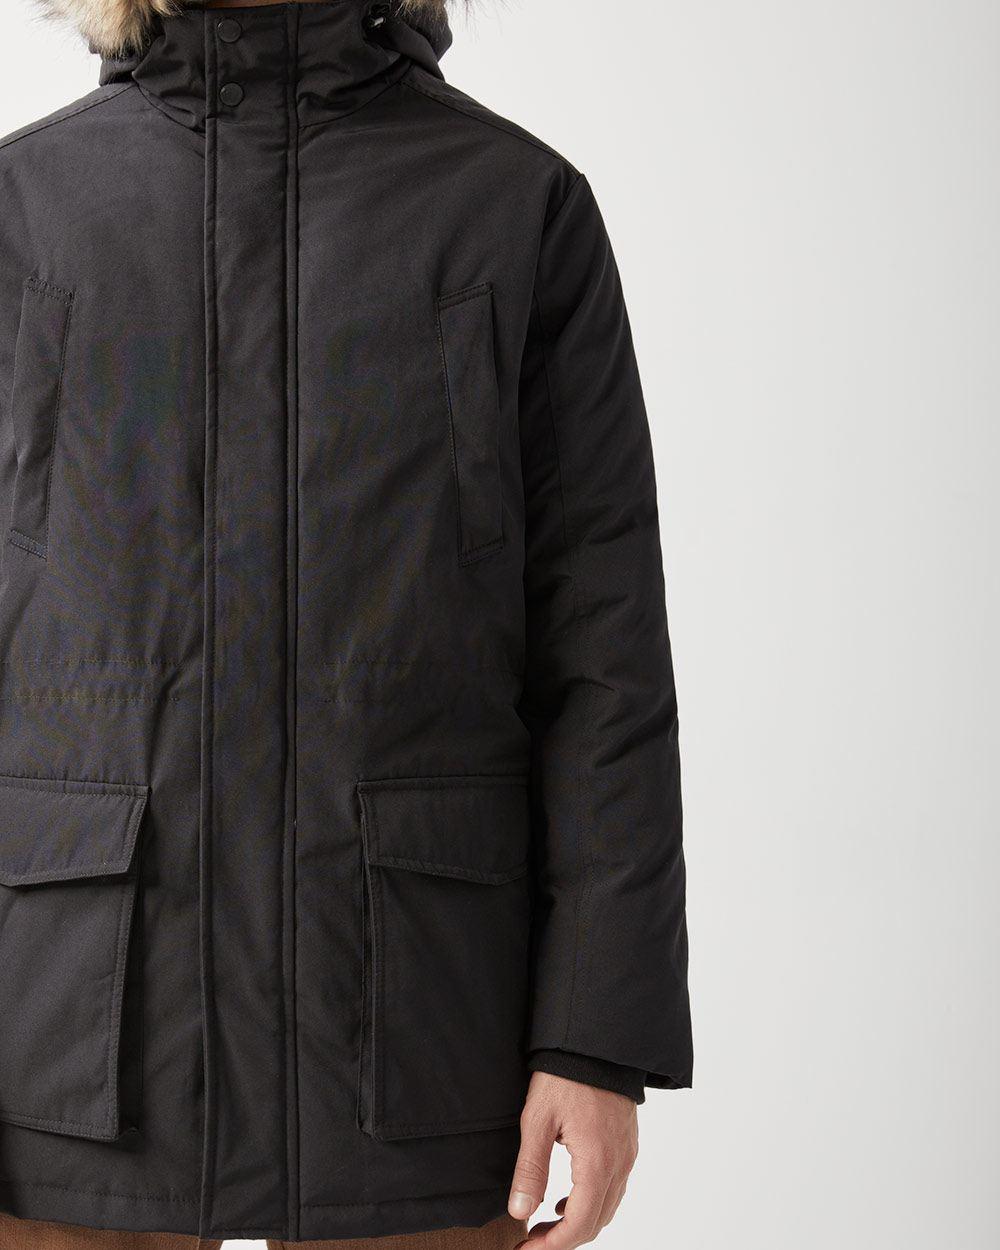 35fc0c299 Down hooded parka jacket